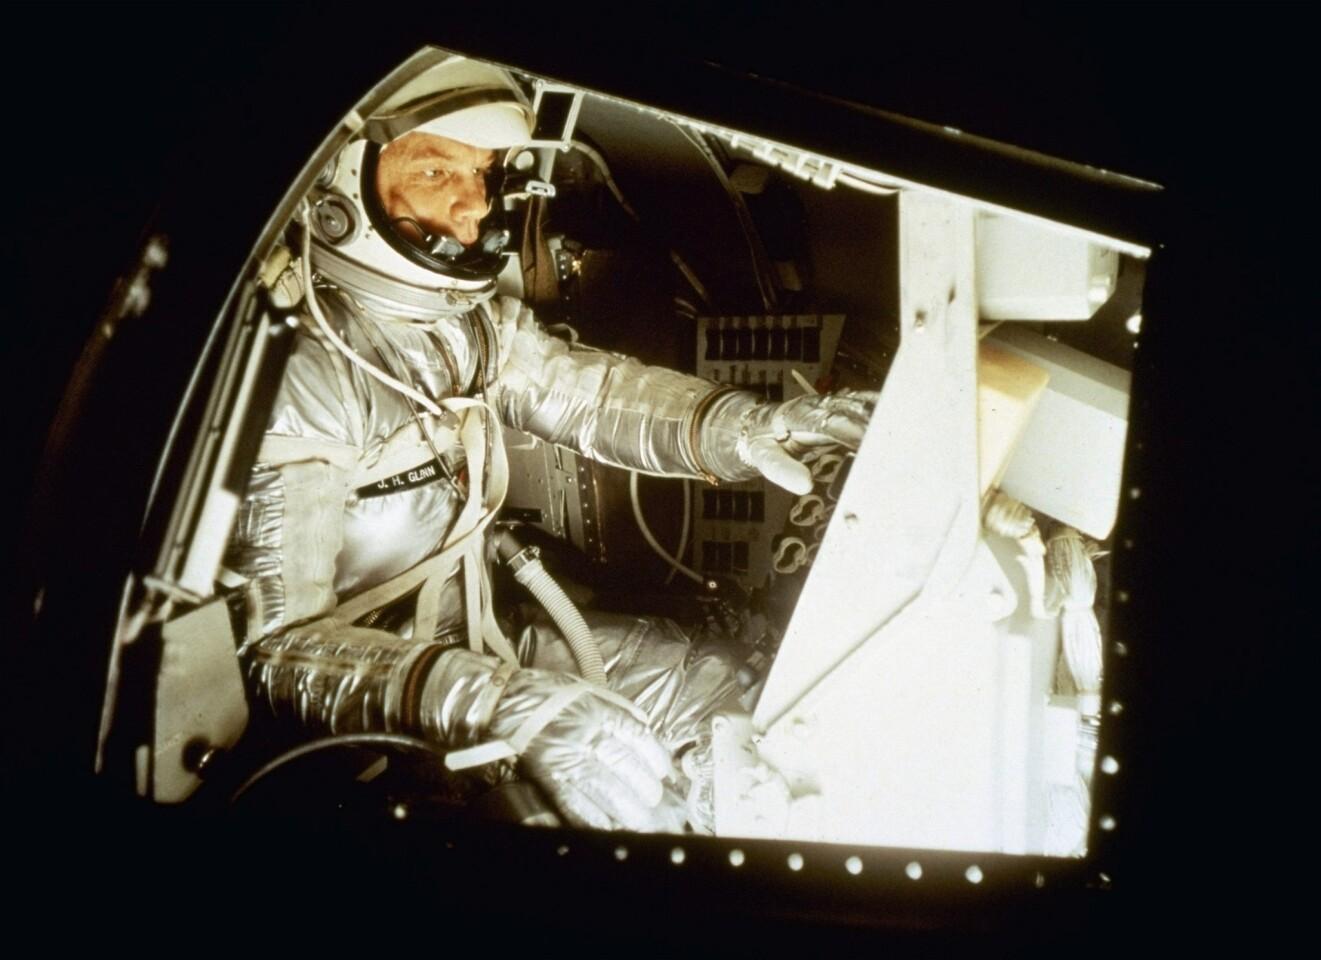 John Glenn dies at 95; hero was first American to orbit Earth - Los Angeles  Times